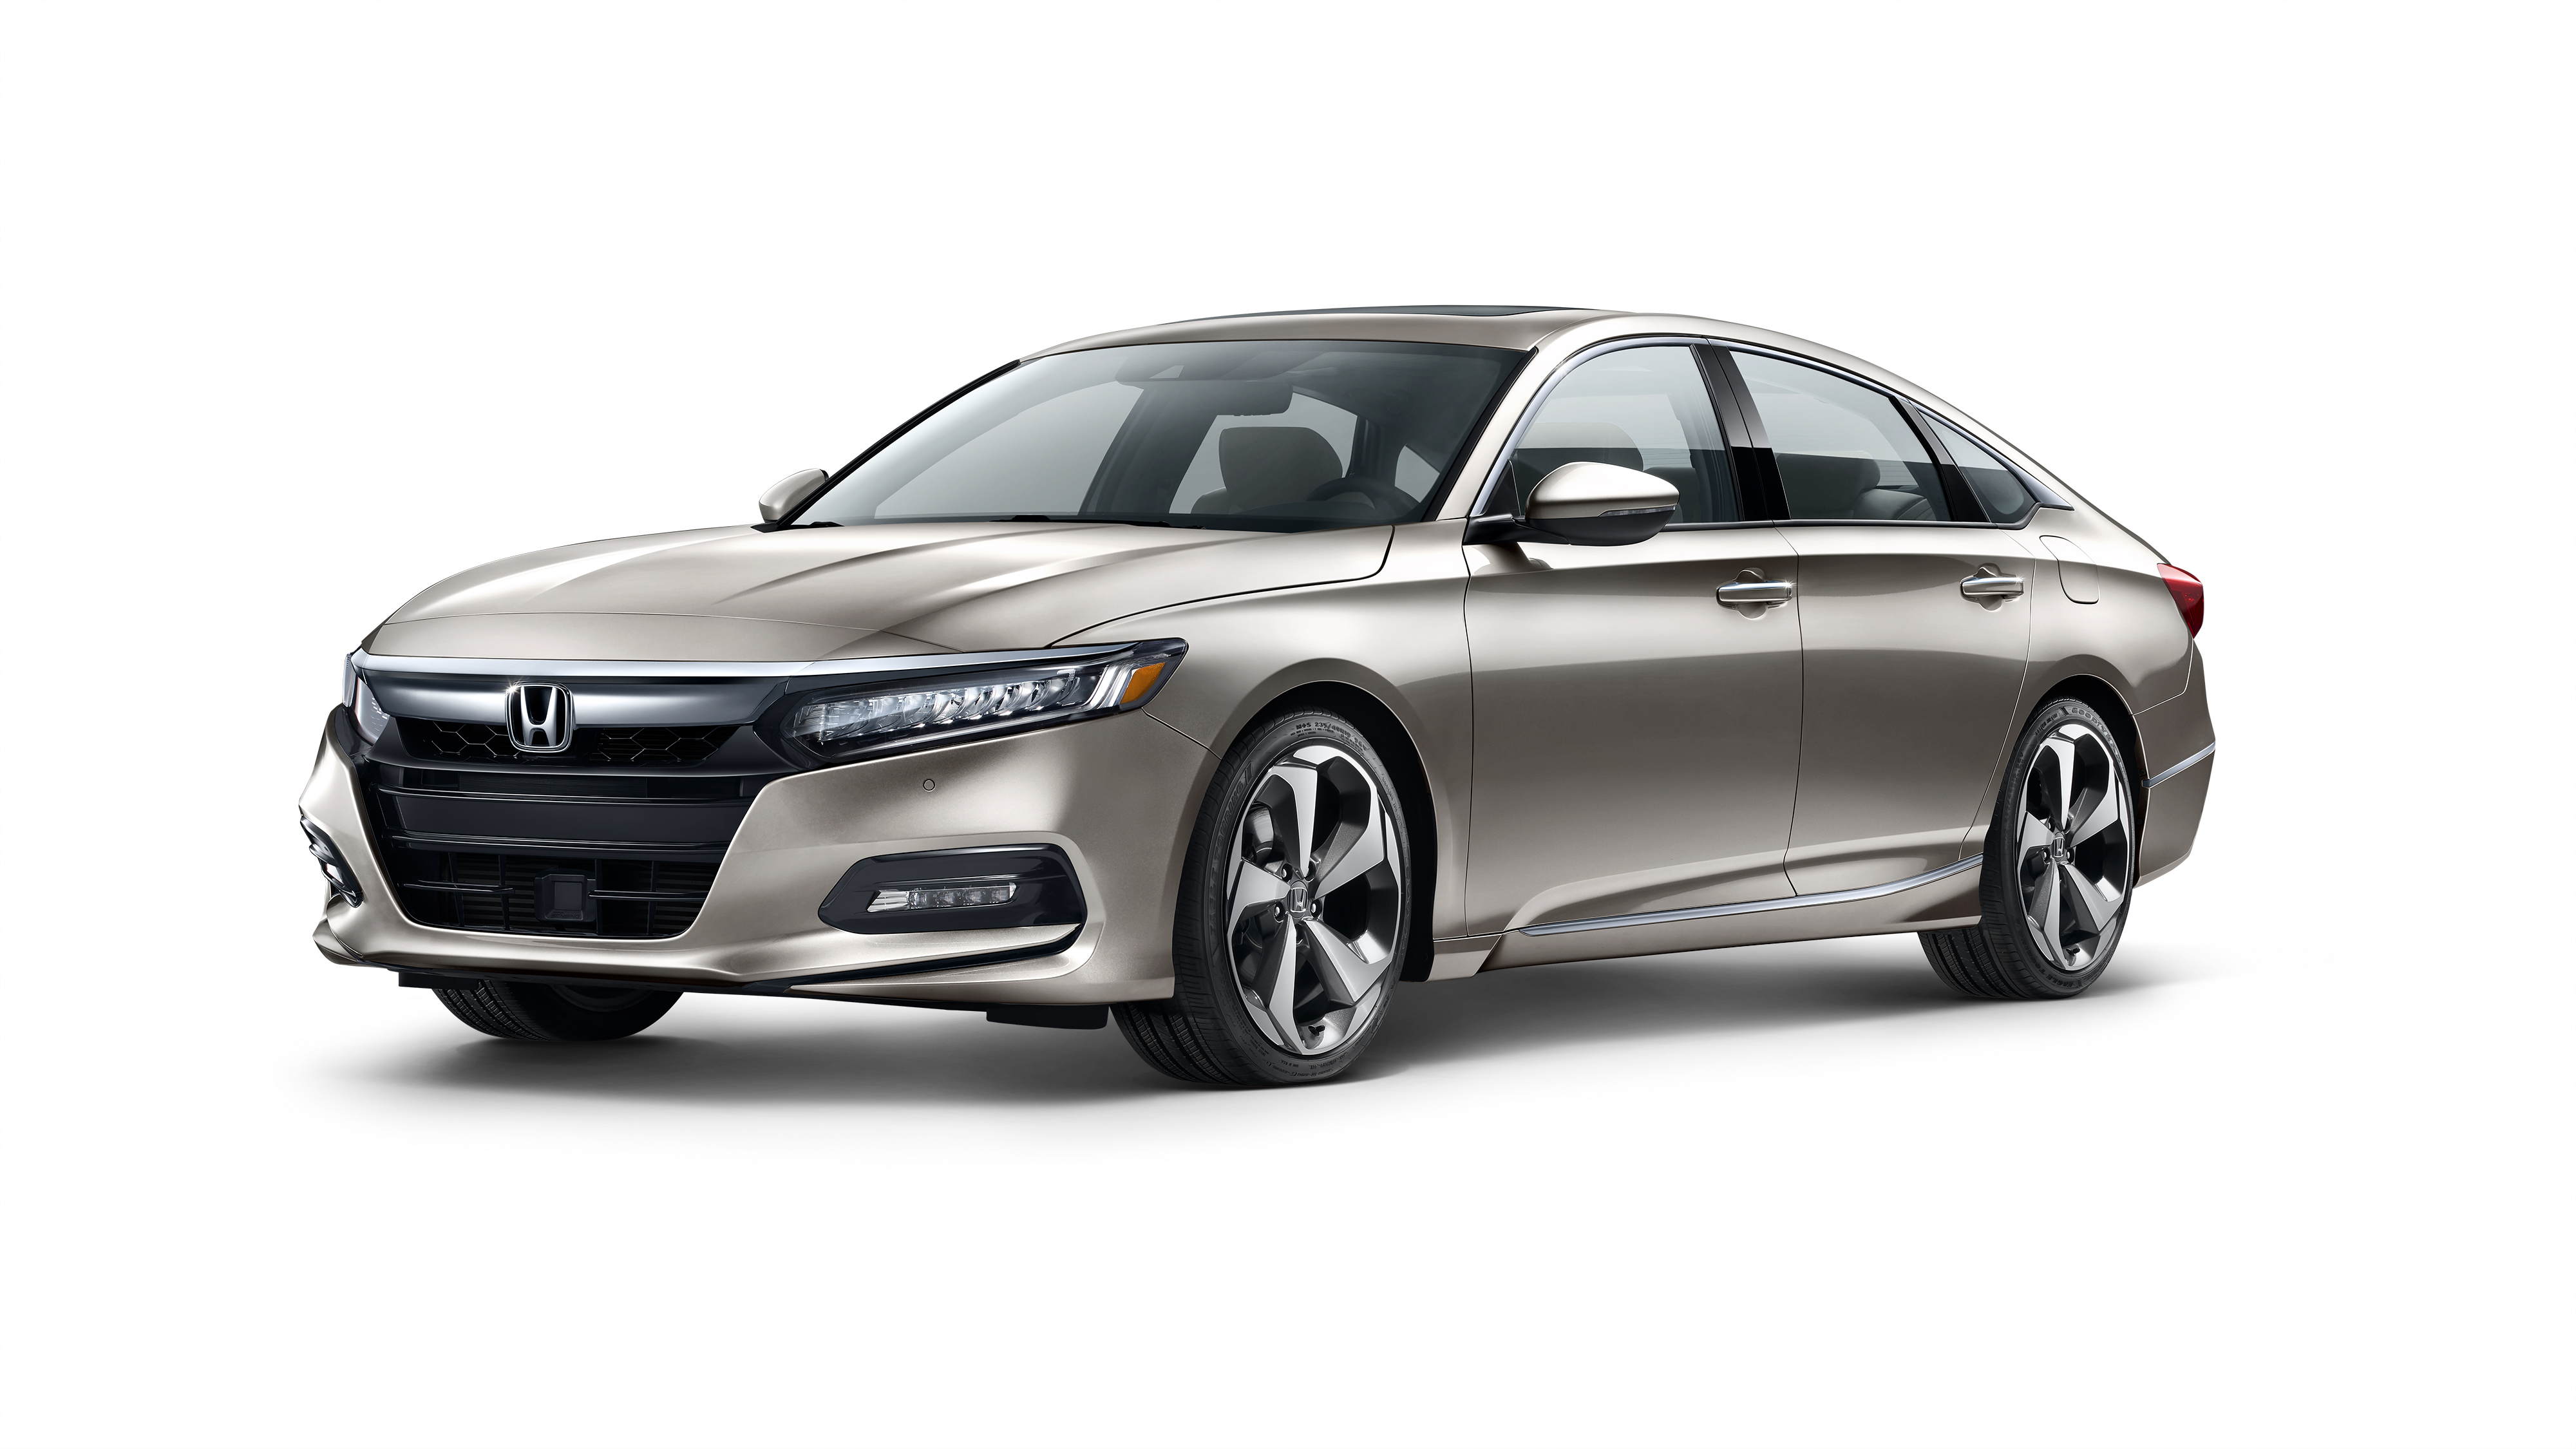 Personal Car Lease Deals No Deposit